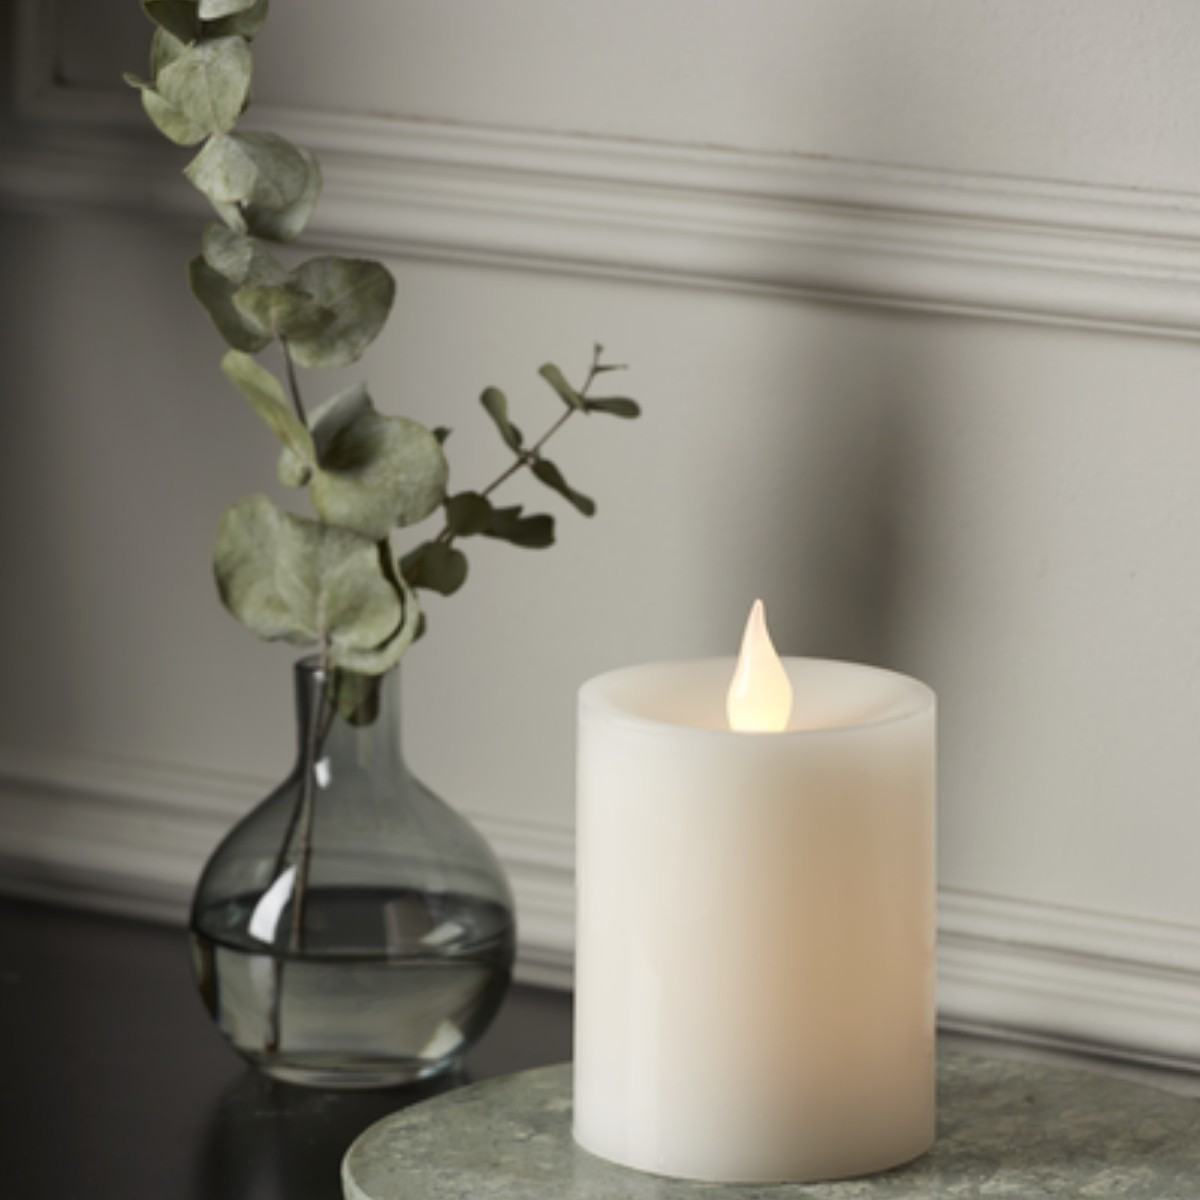 LED Stumpenkerze Flame - Echtwachs - flackernde warmweiße LED - H: 12cm - Batteriebetrieb - Timer